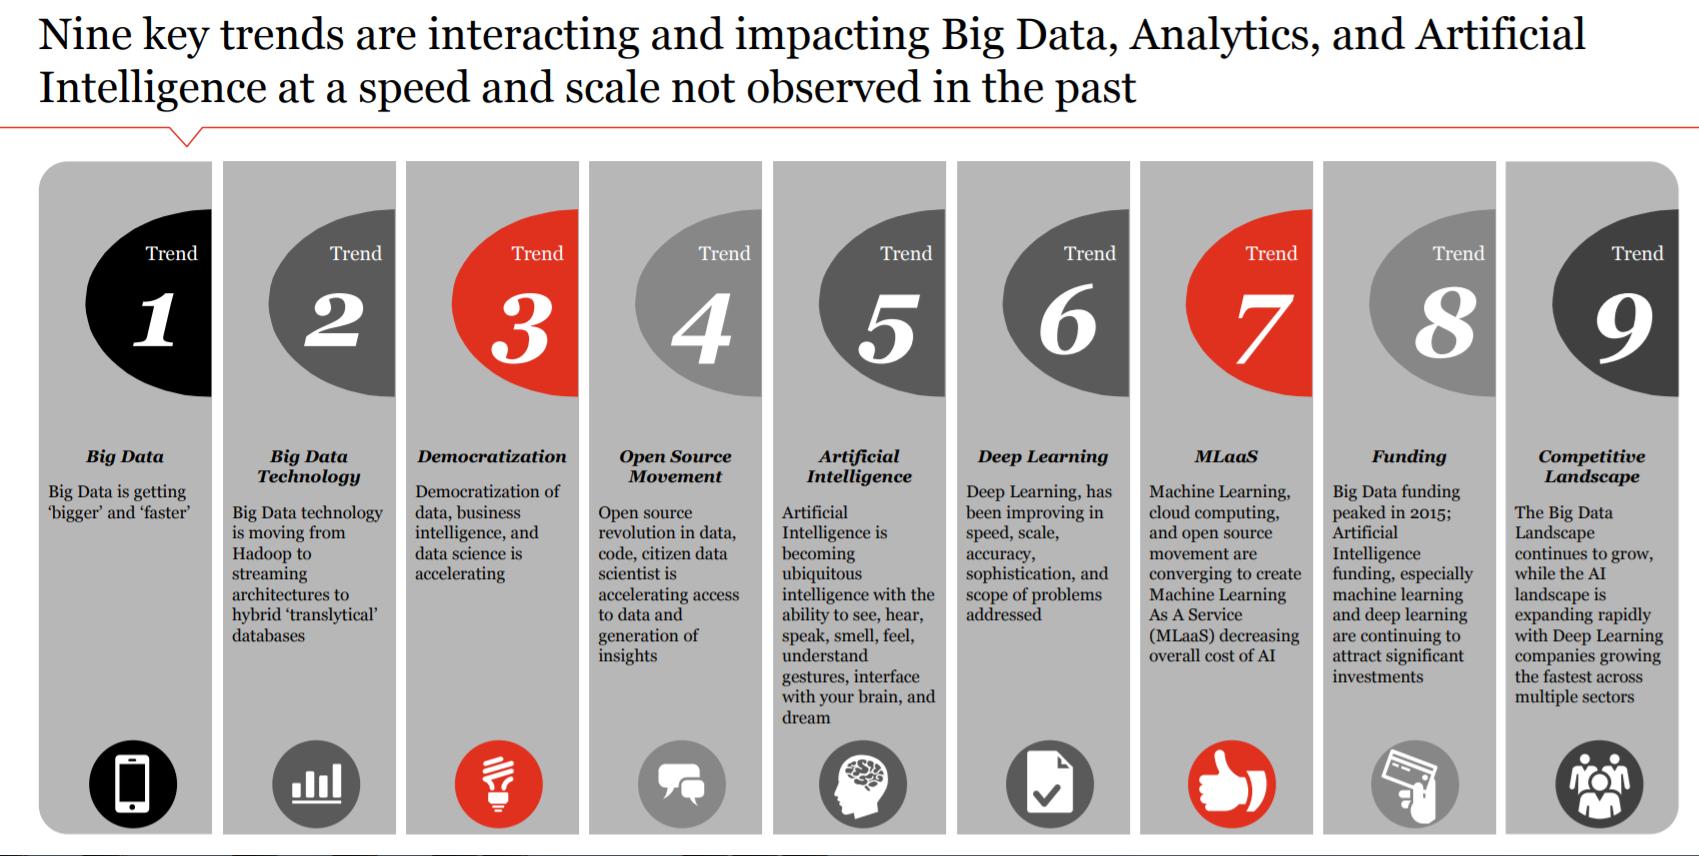 9 trends impacting big data and analytics